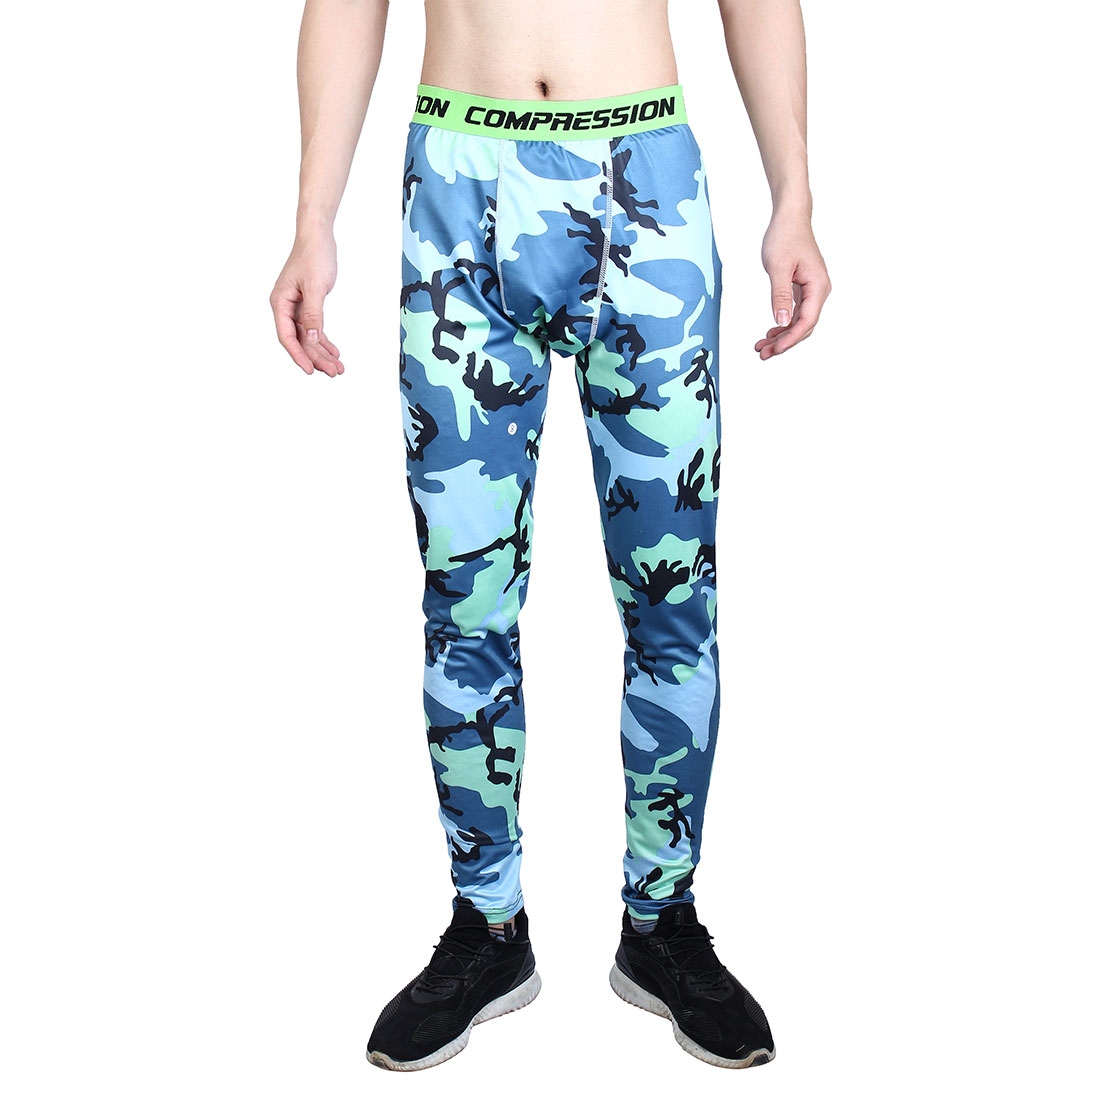 Men Polyester Fiber Compression Base Layer Pants Green Camouflage L US W28 by Unique Bargains